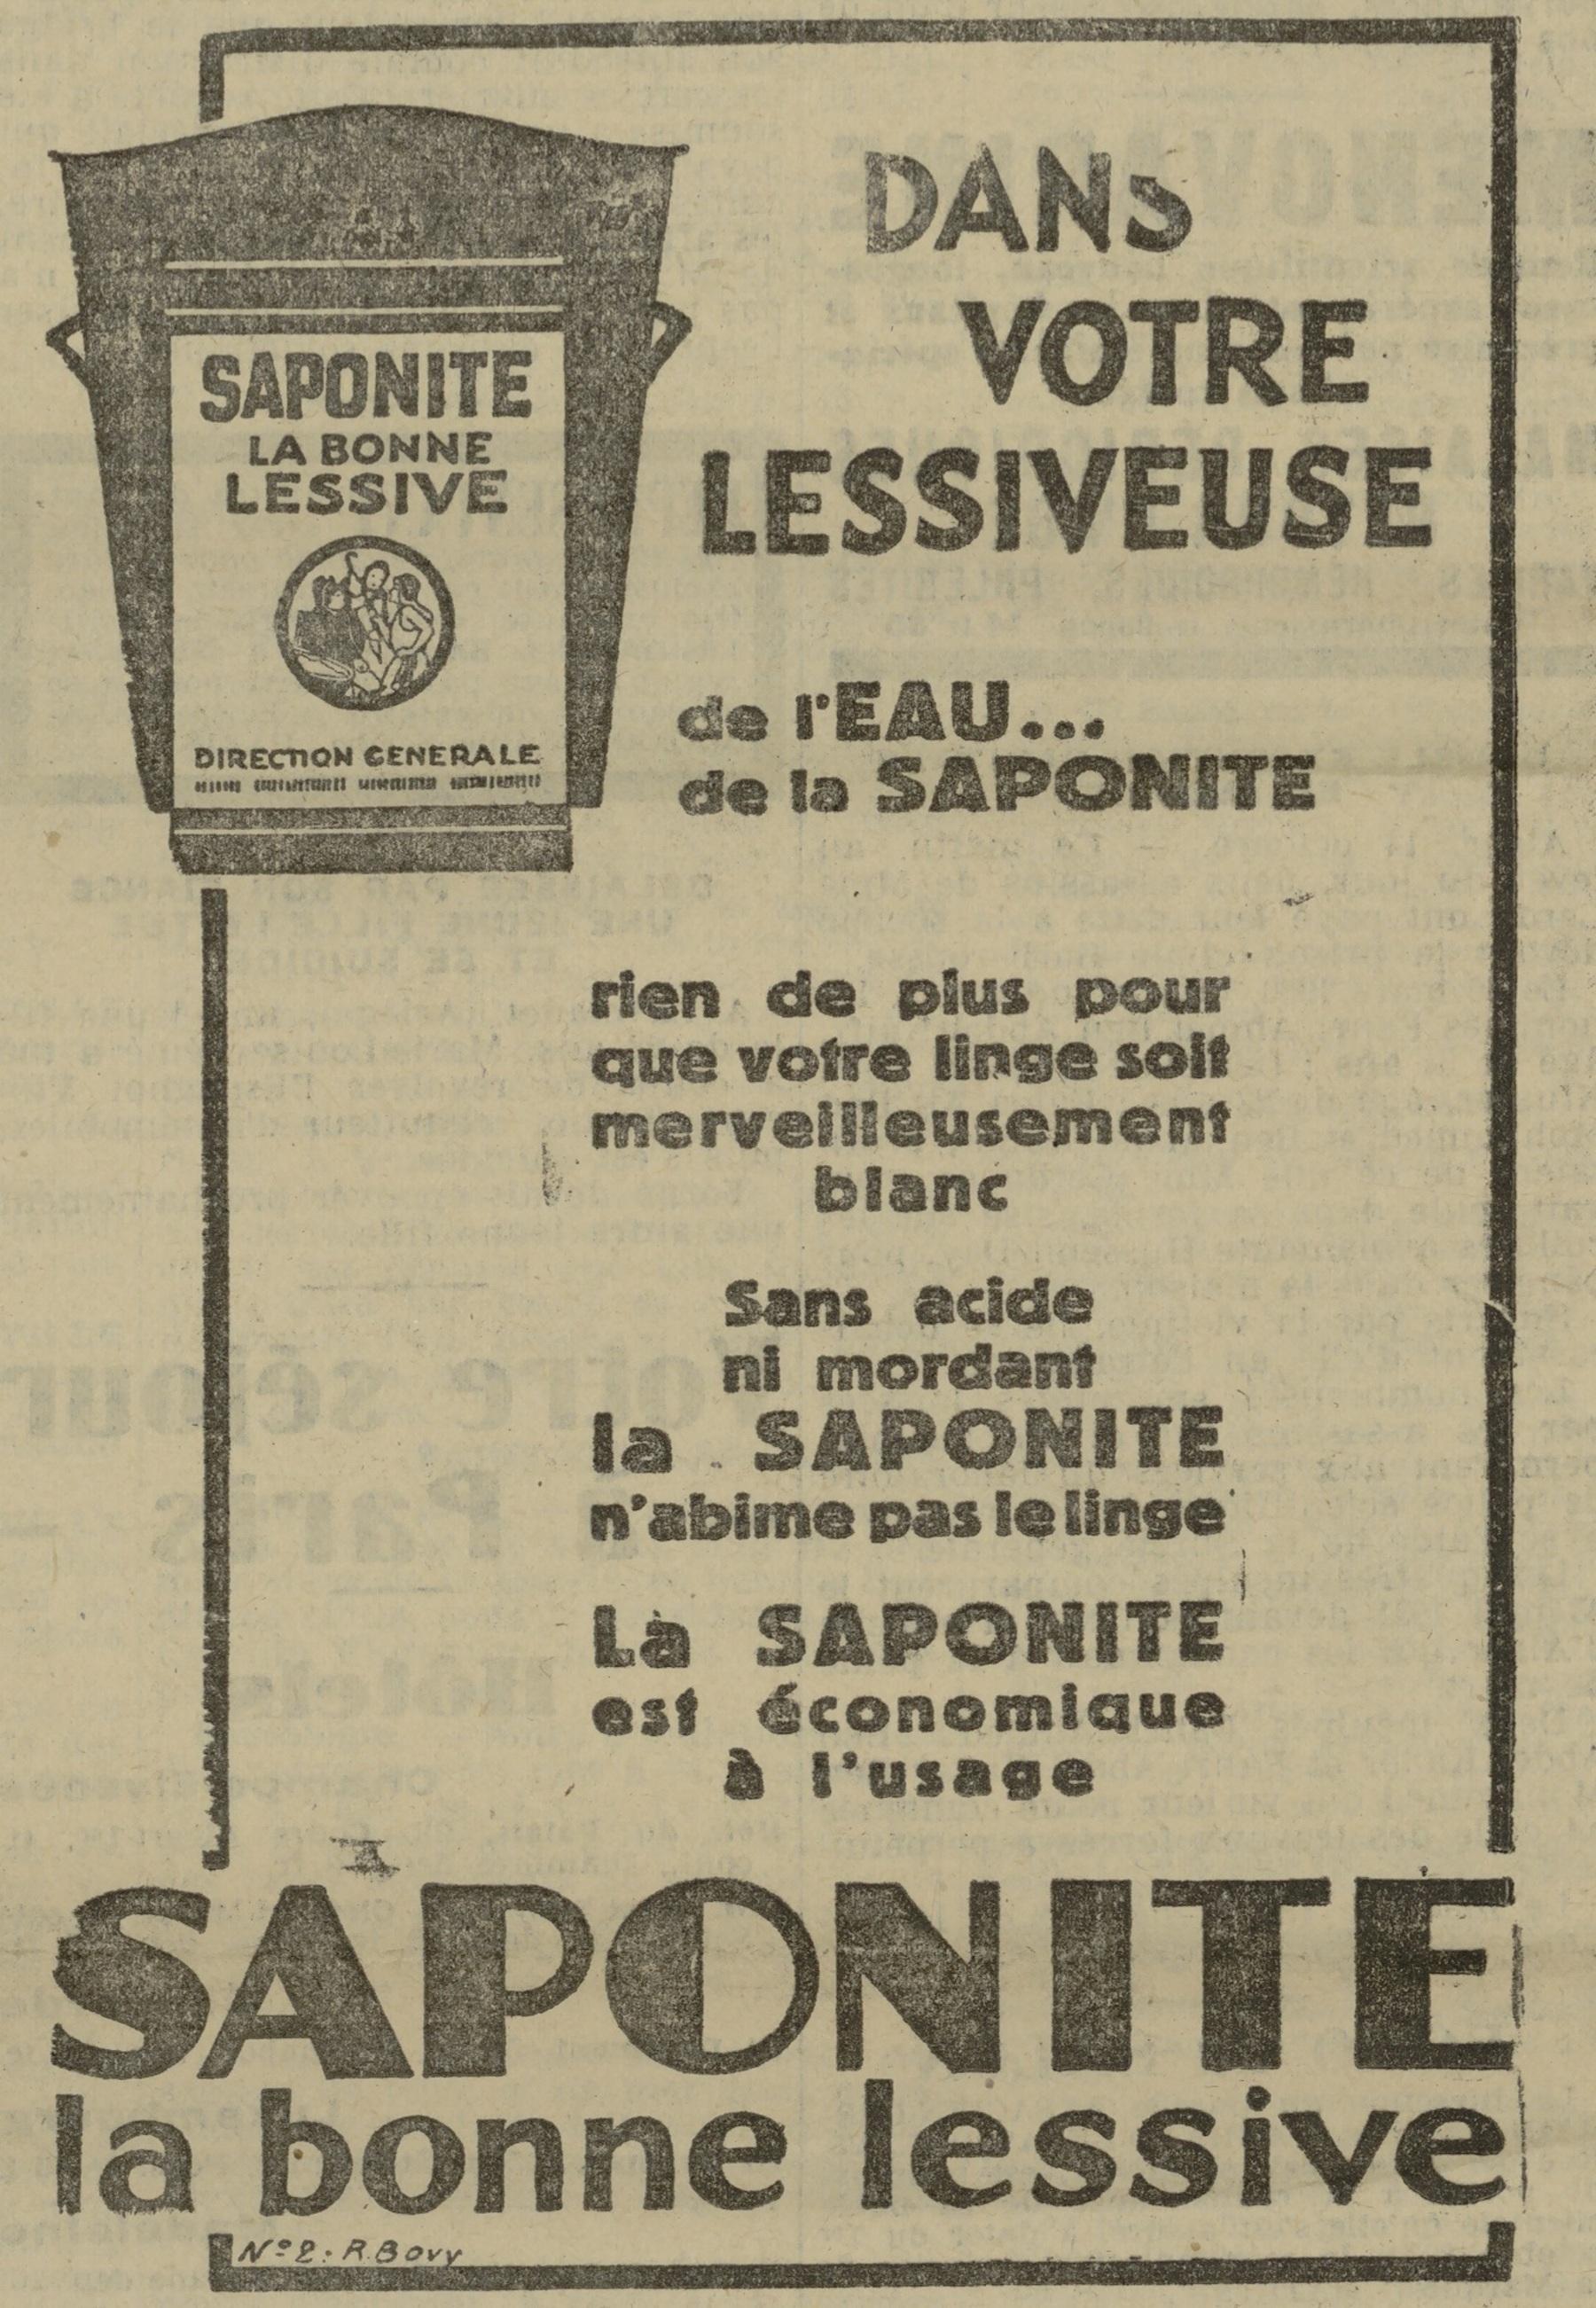 Contenu du La Saponite